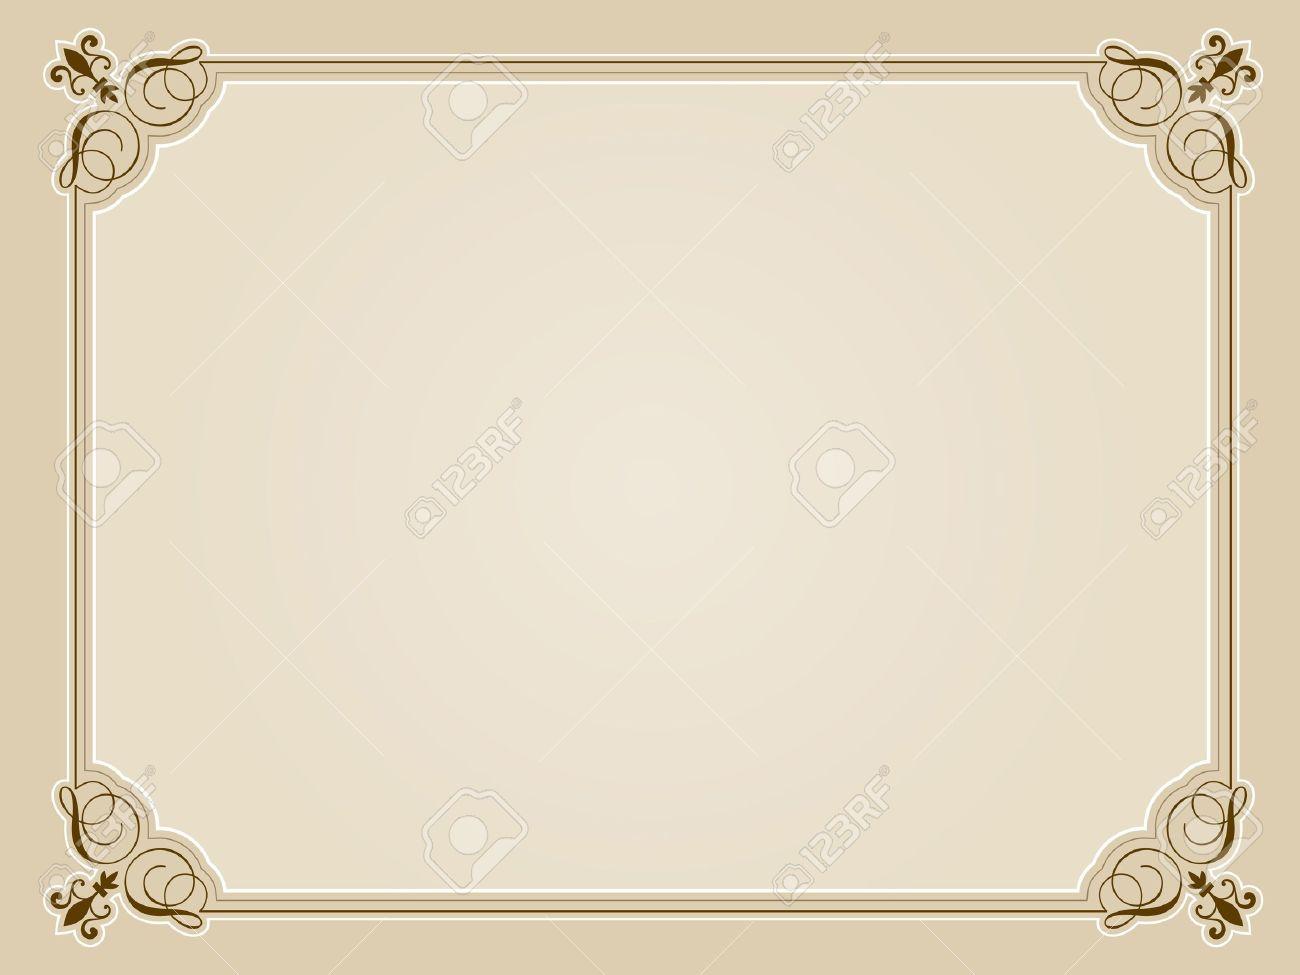 blank certificate design